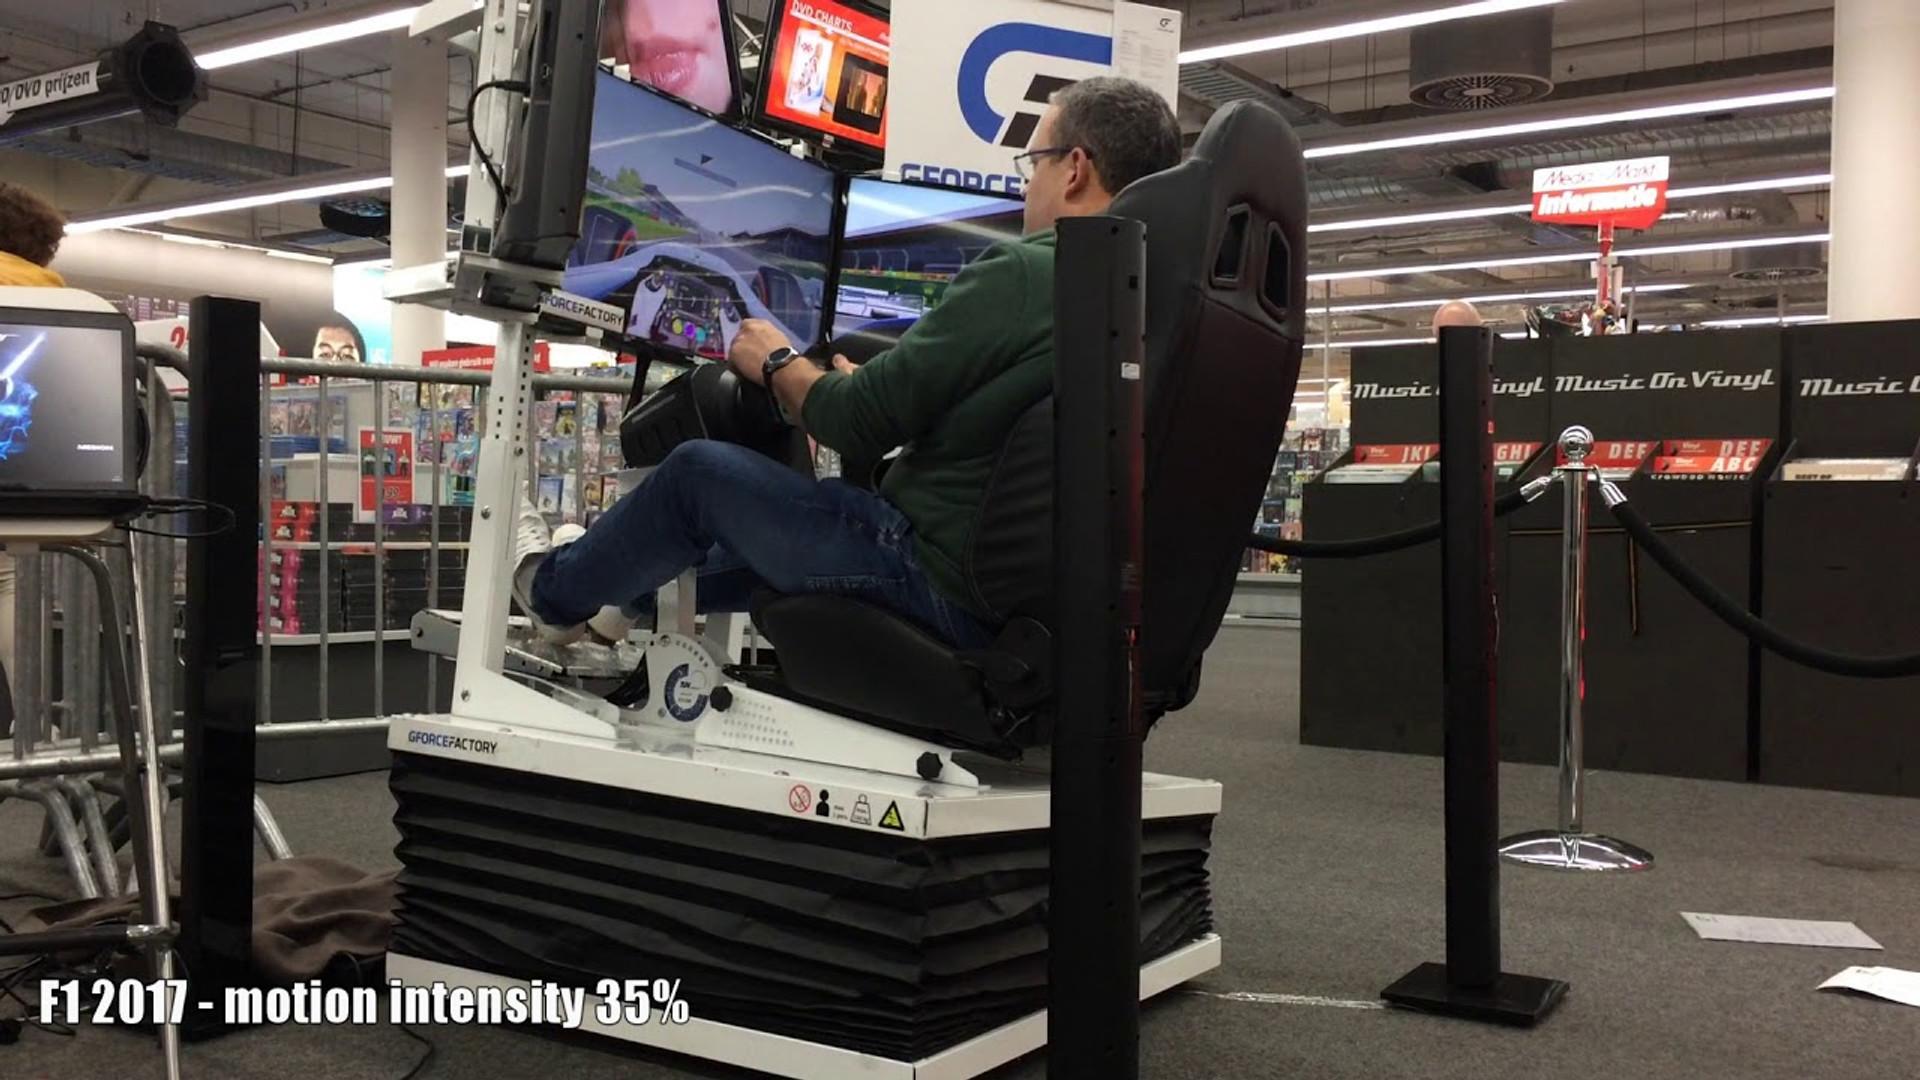 6DoF driving simulators for sale